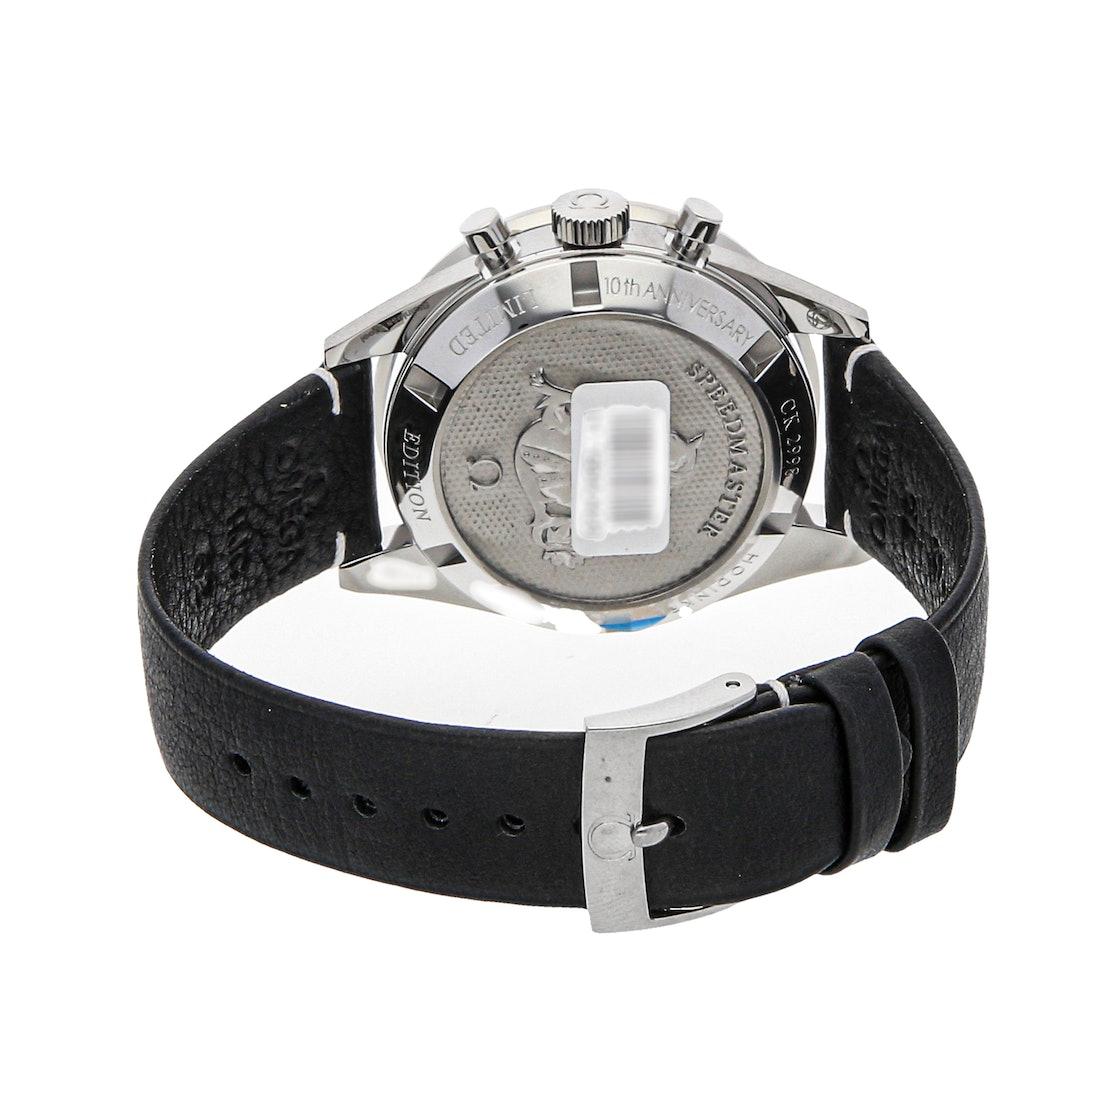 "Omega Speedmaster Moonwatch 10th Anniversary ""Hodinkee"" Limited Edition 311.32.40.30.06.001"